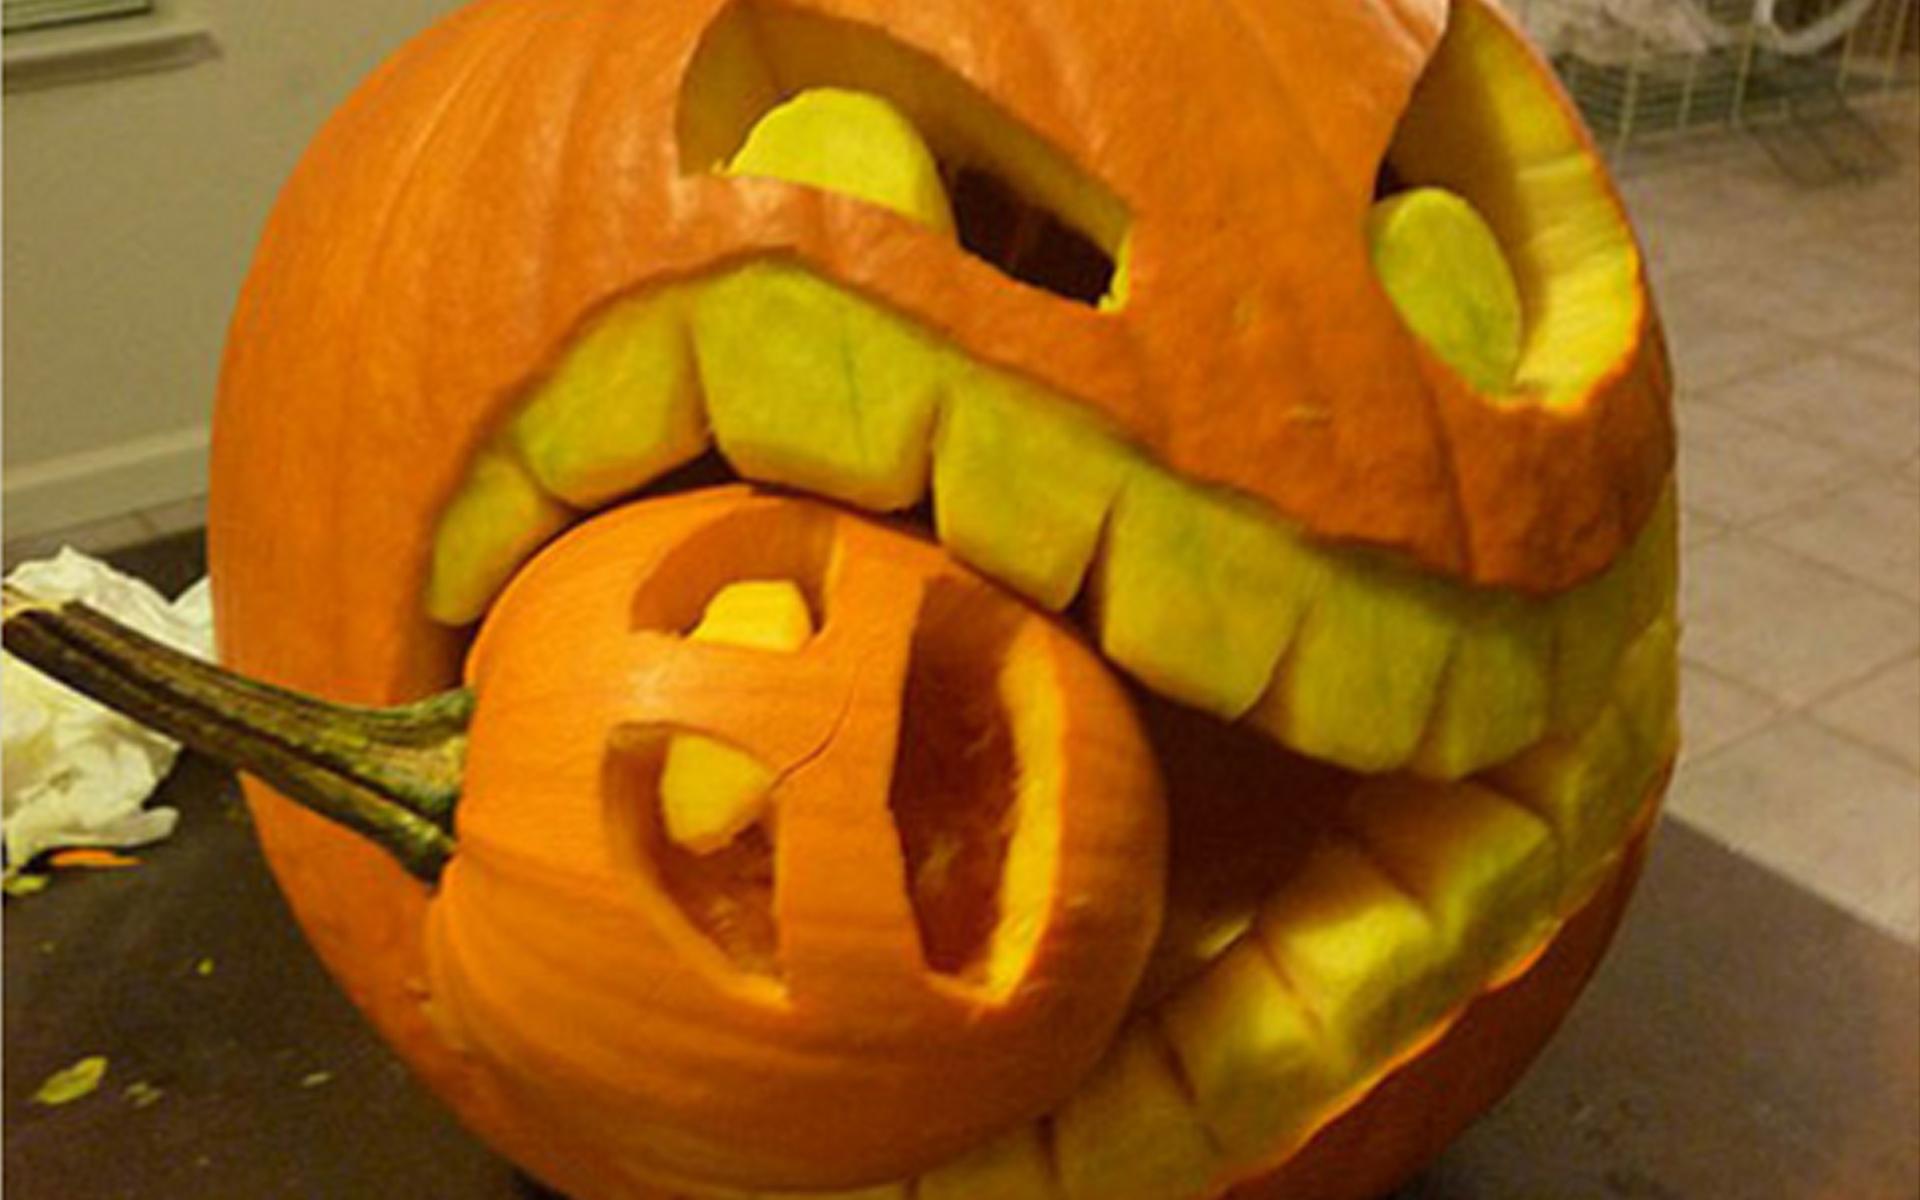 Halloween eating small pumpkin carving creative ads and more halloween eating small pumpkin carving maxwellsz